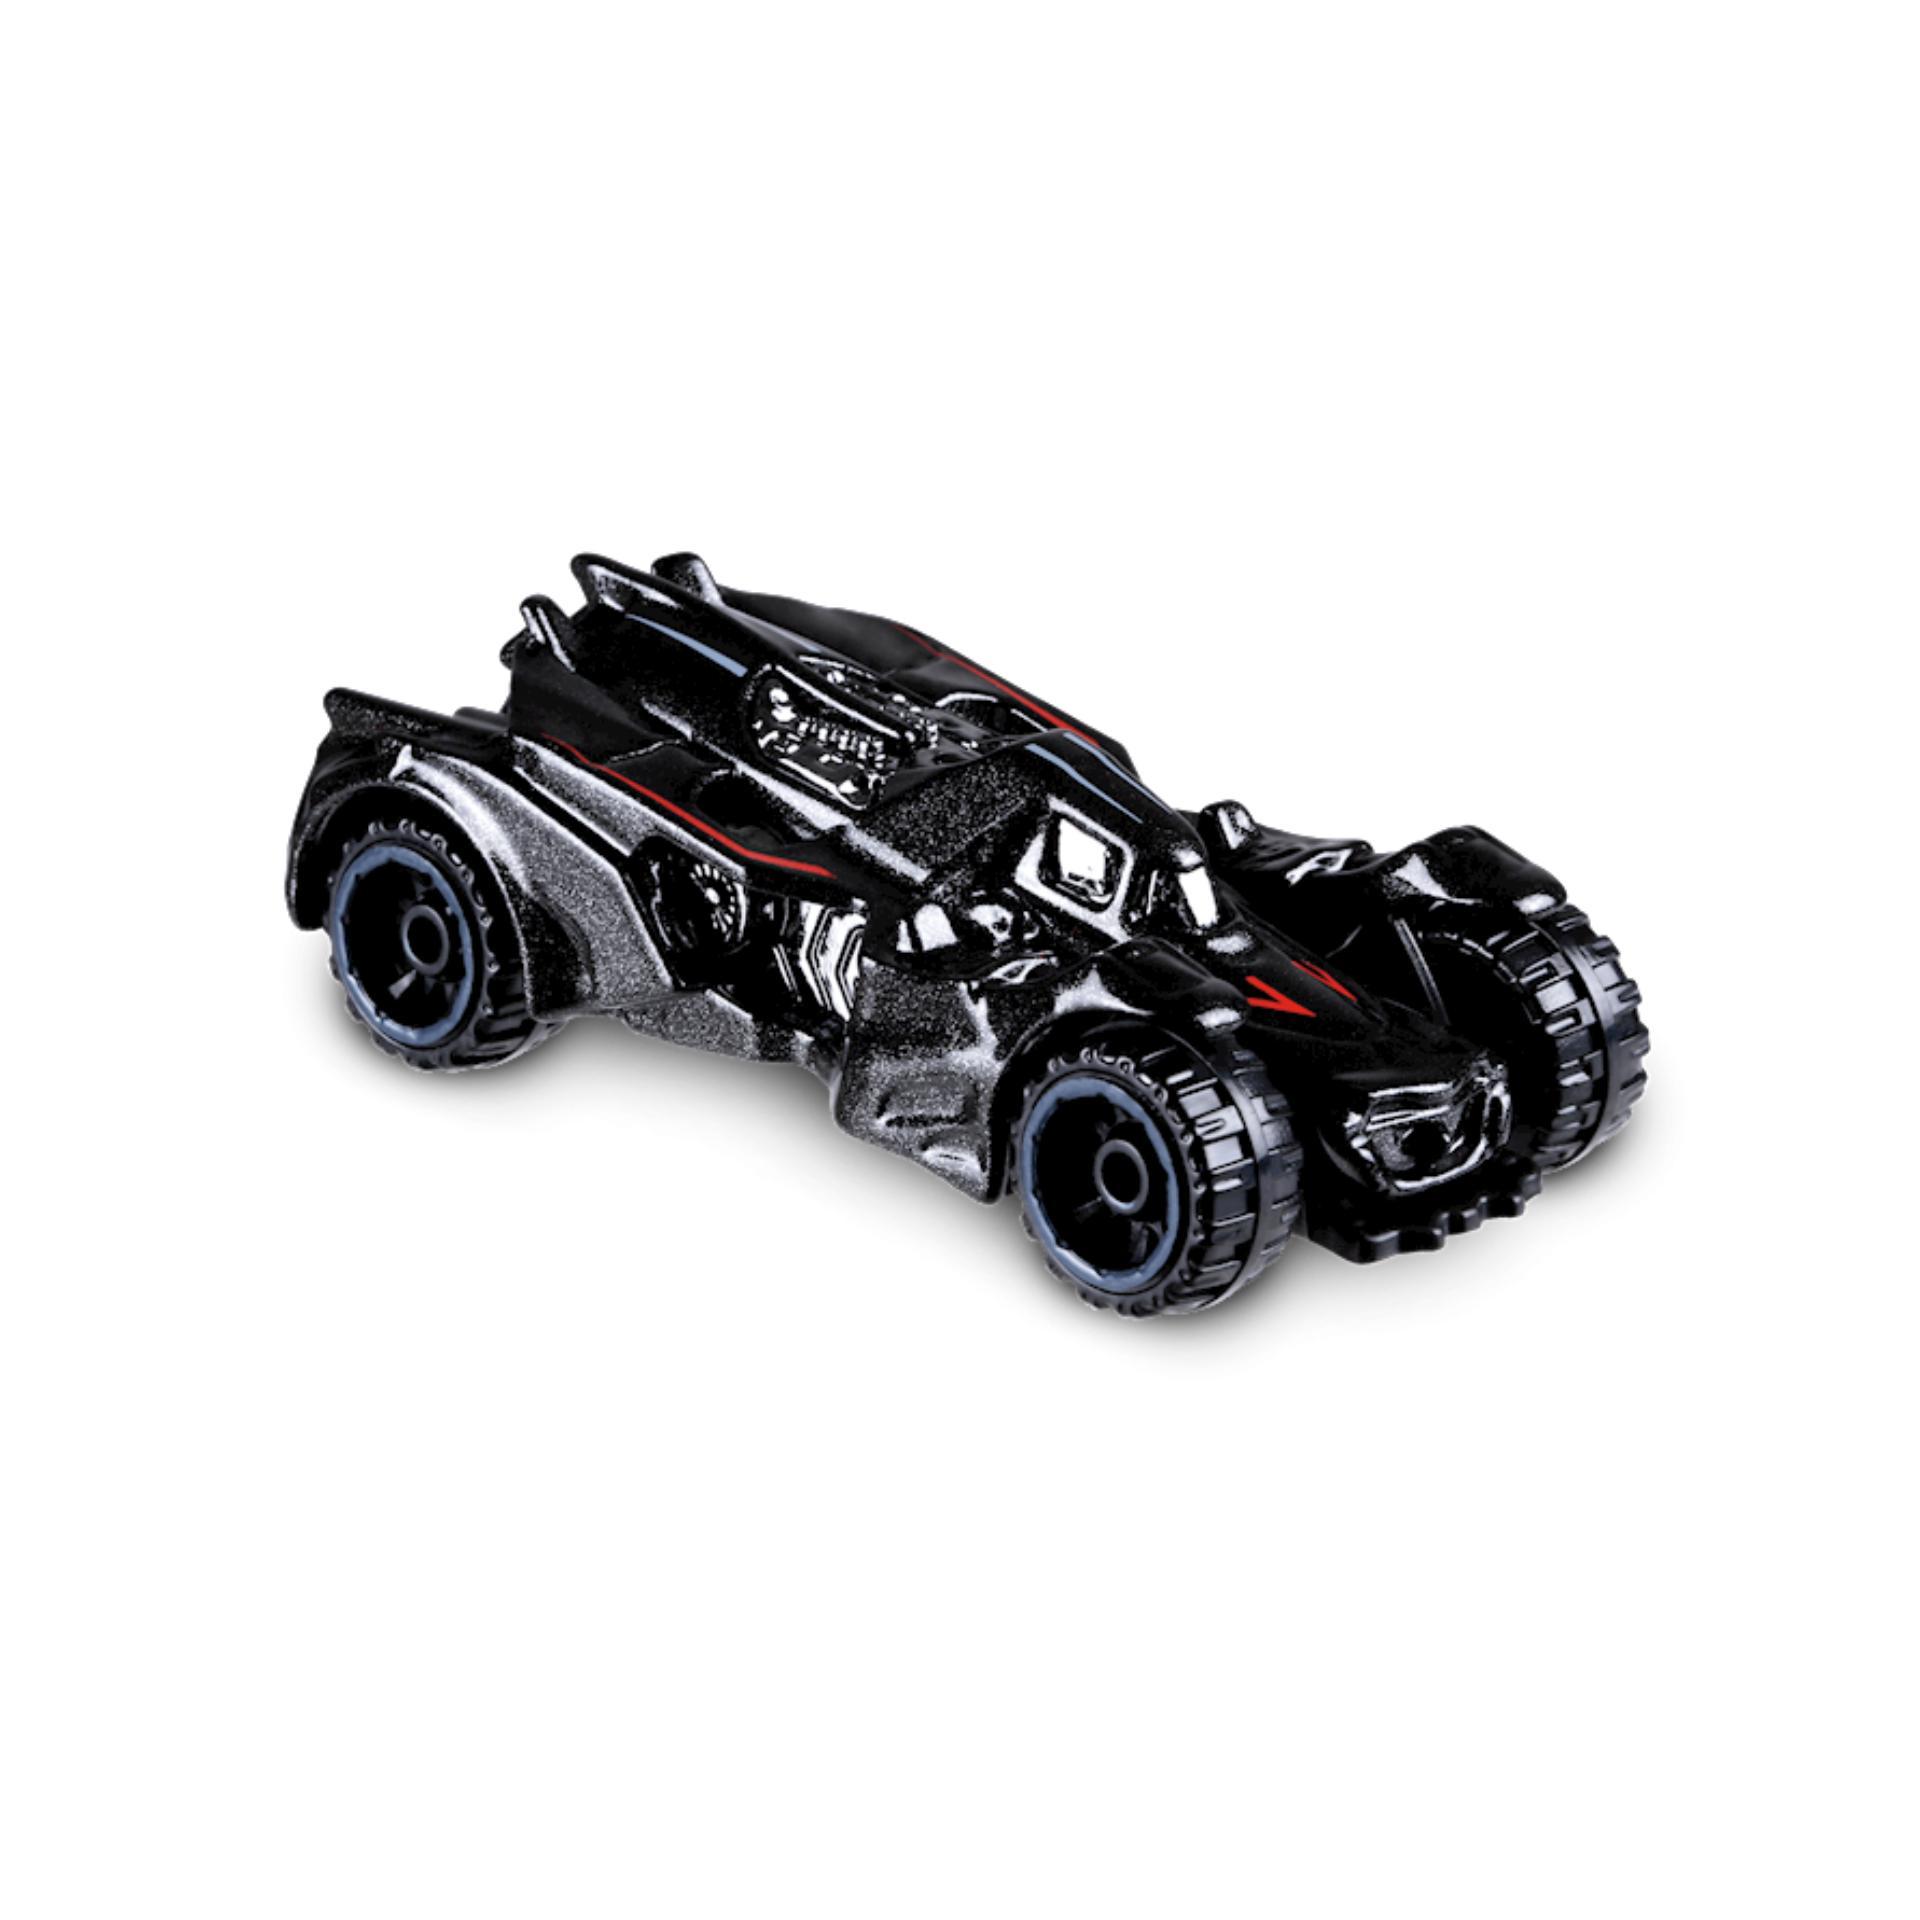 Hot Wheels Basic Car (DC: AEFE) - Batman: Arkham Knight Batmobile